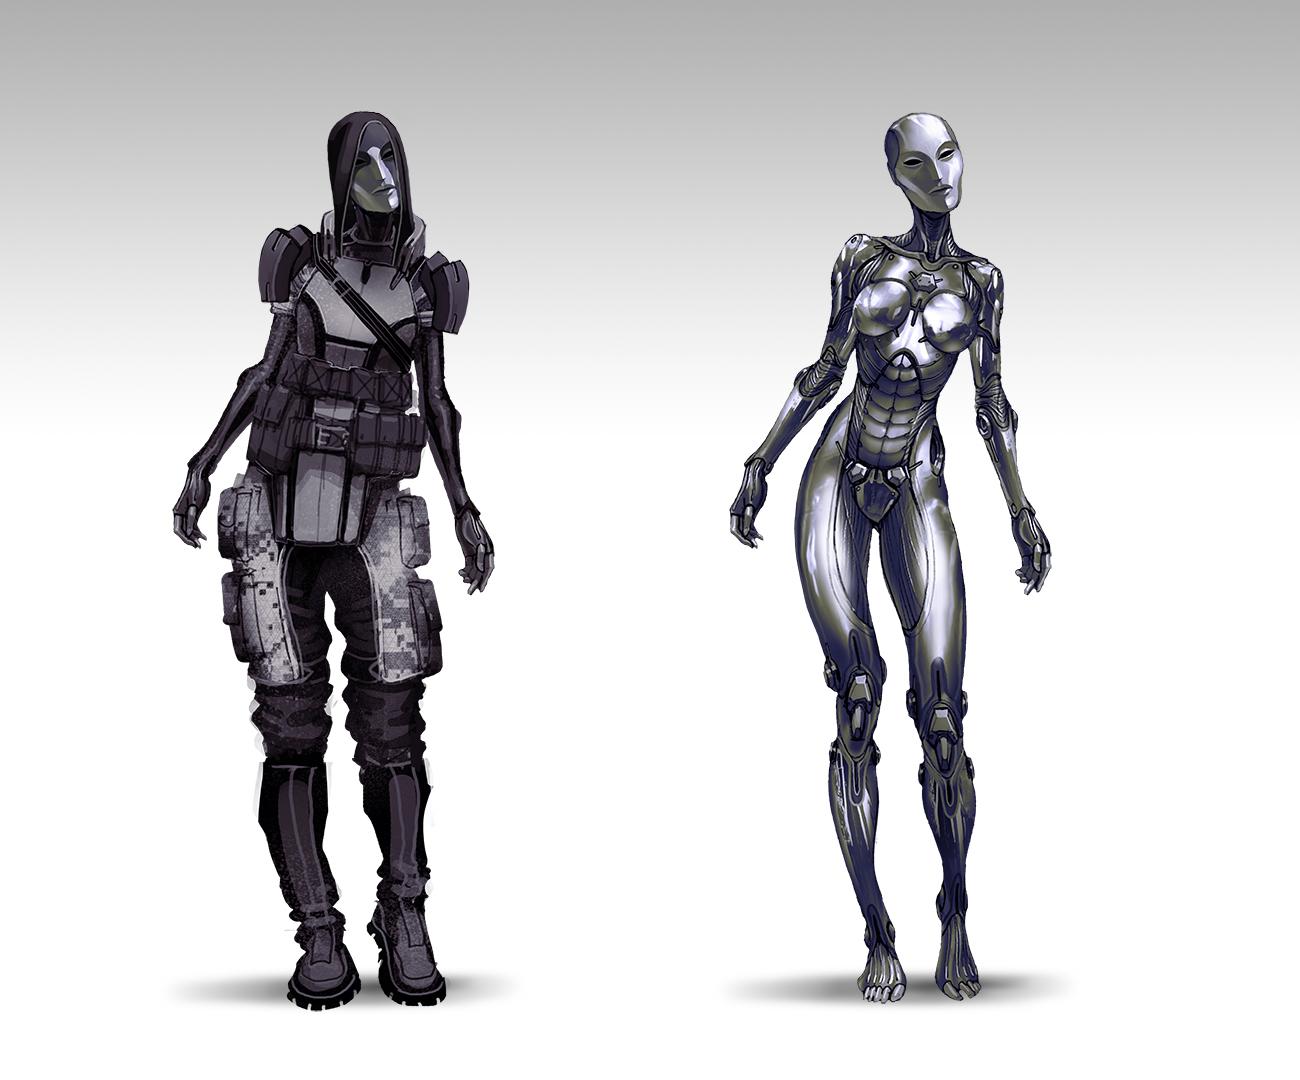 Bioware Shares Early Concept Artalientali Designs For Mass Effect